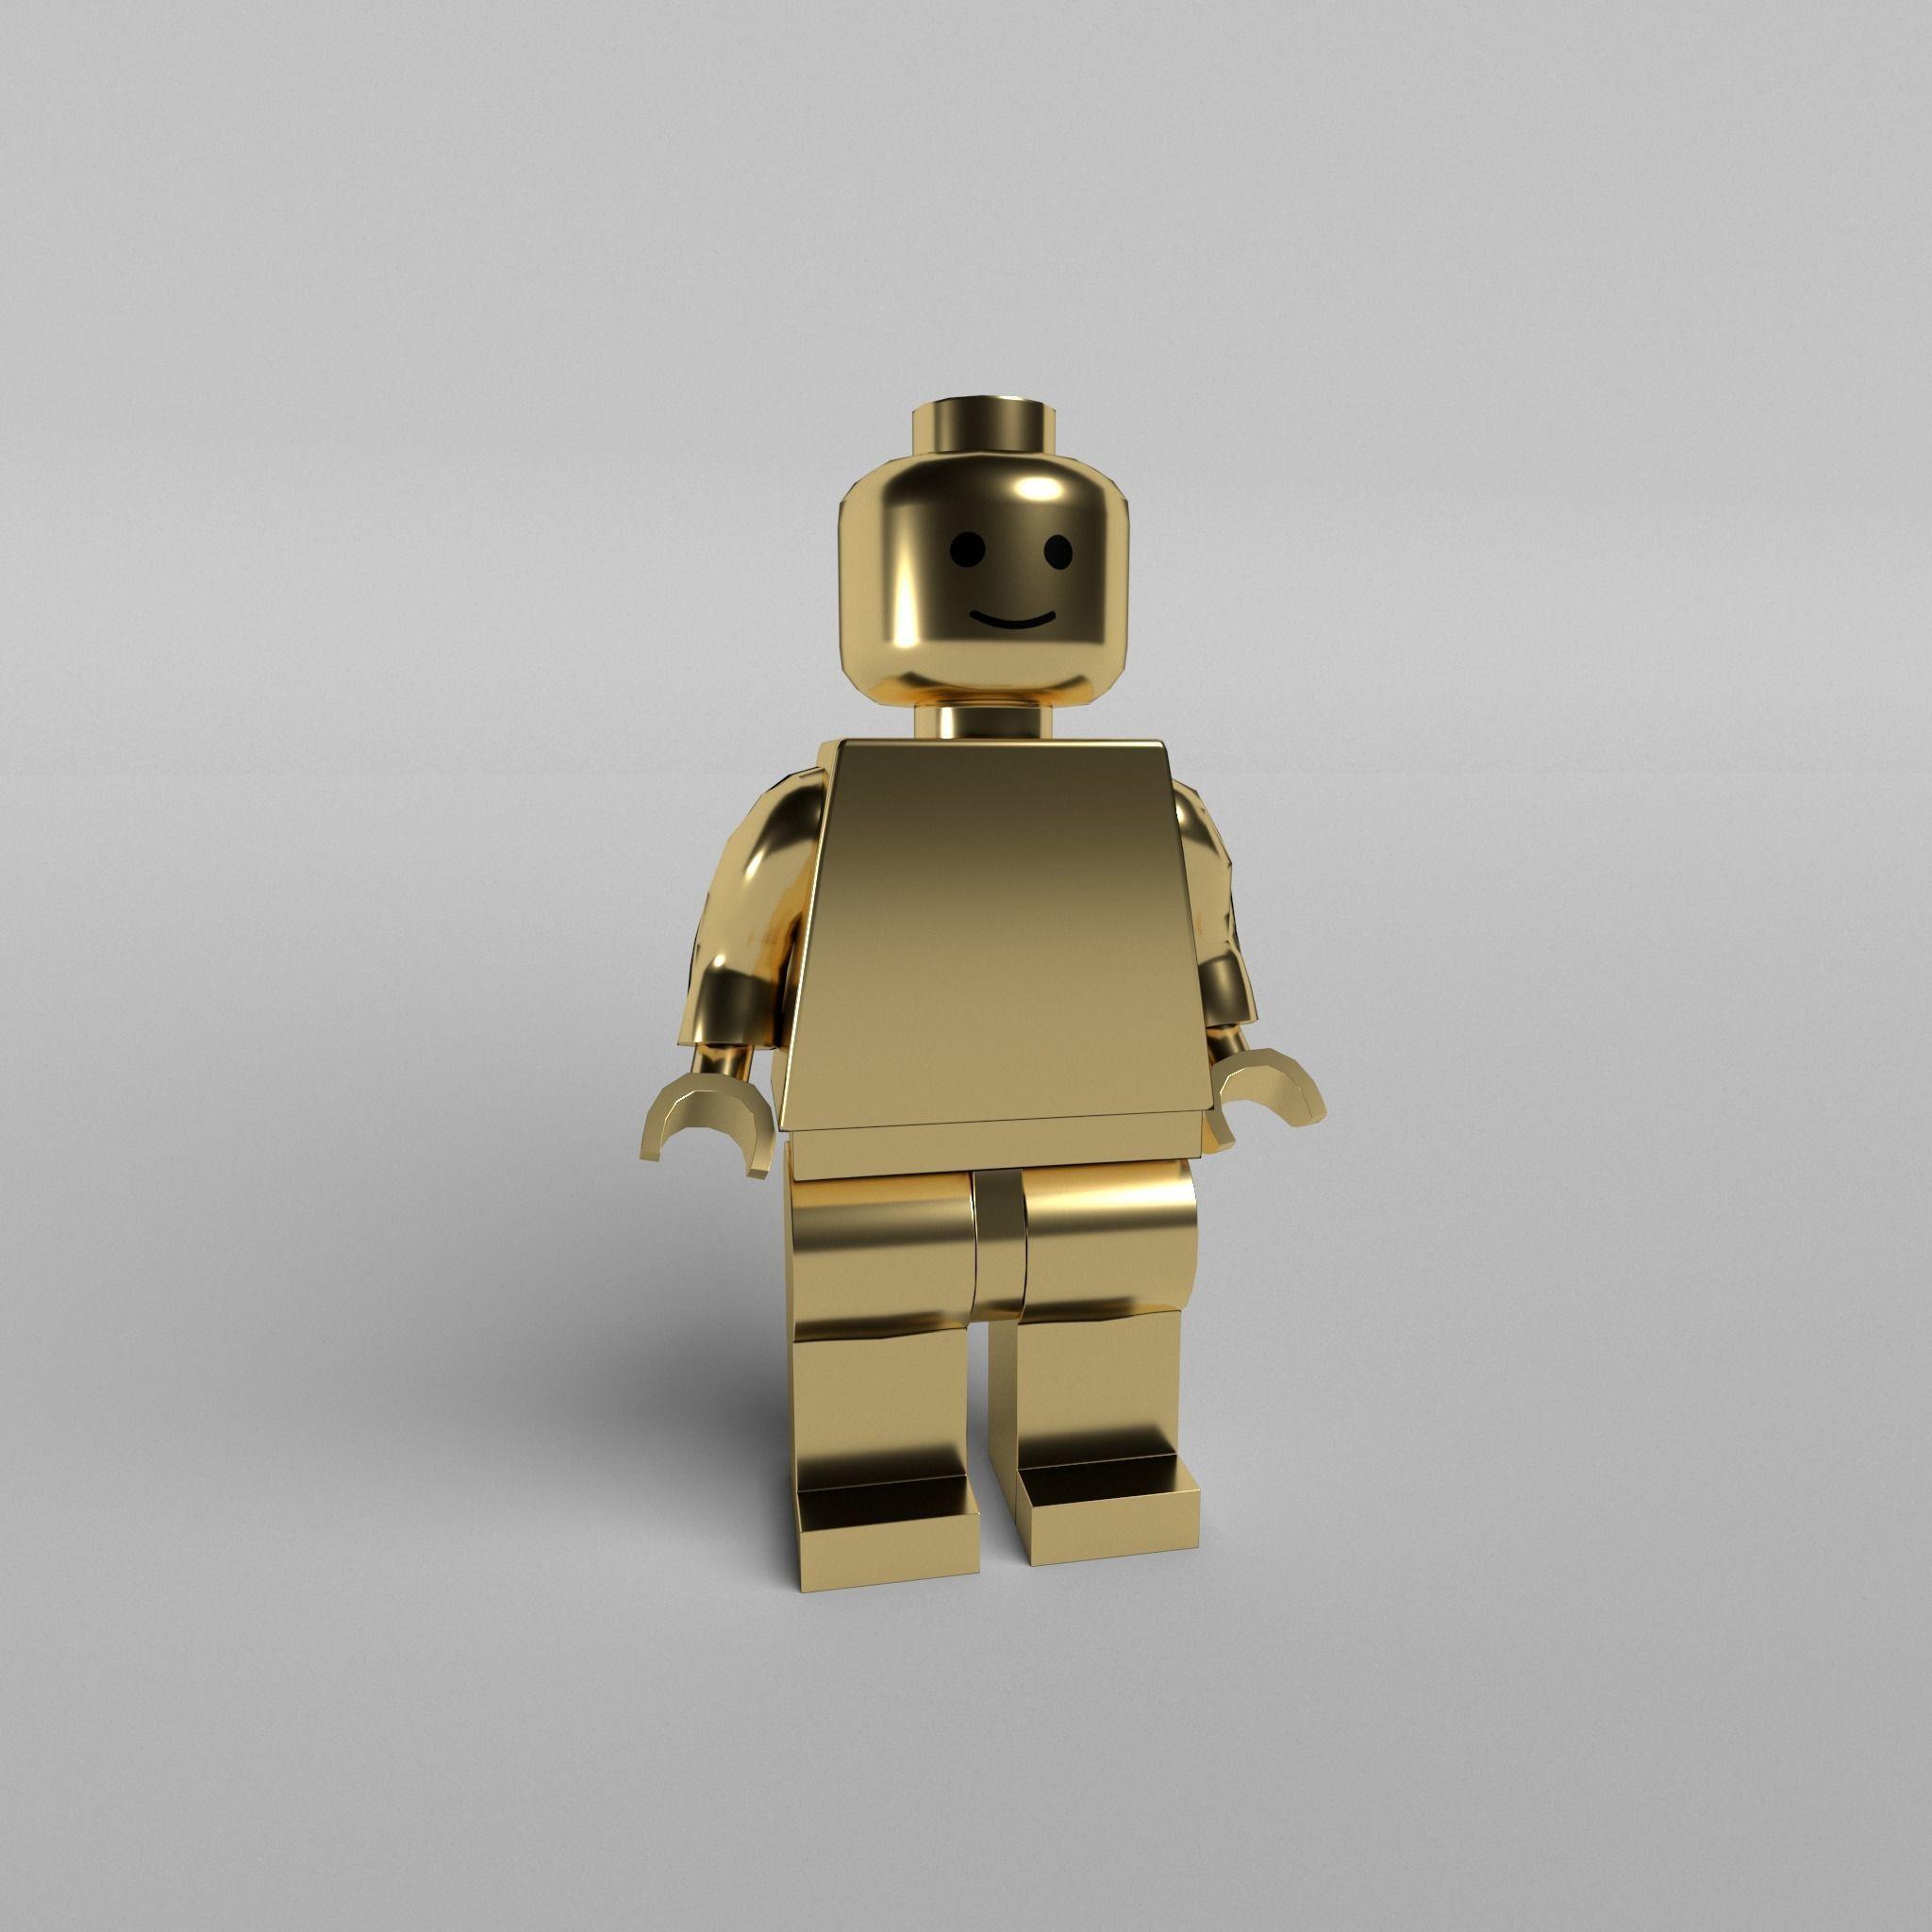 lego face base models poly low various obj cgtrader vr ar stl ma